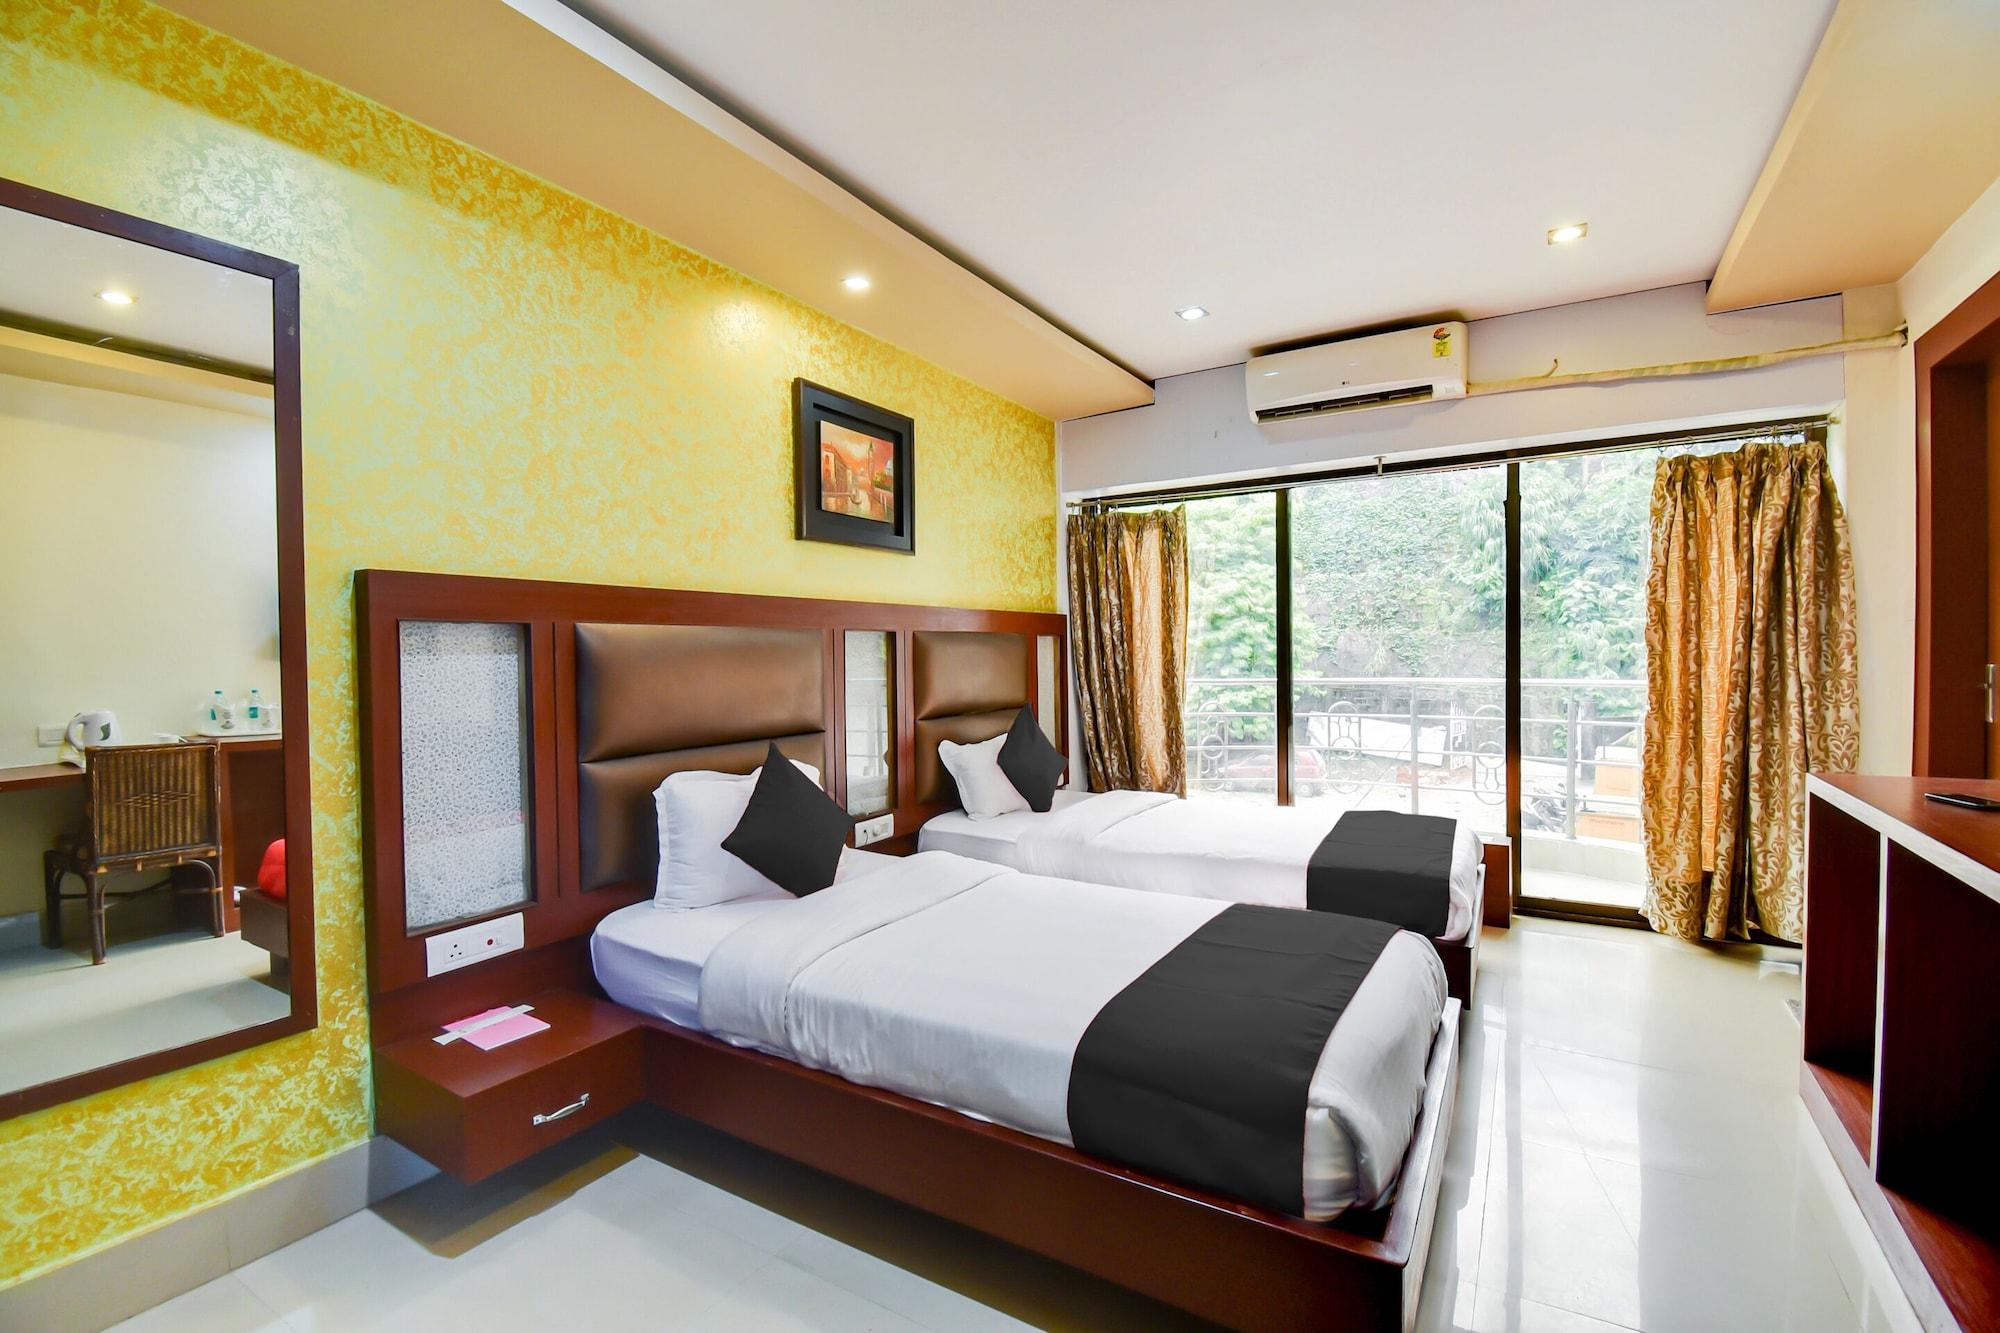 Capital O 44652 Hotel PYBSS, Papum Pare